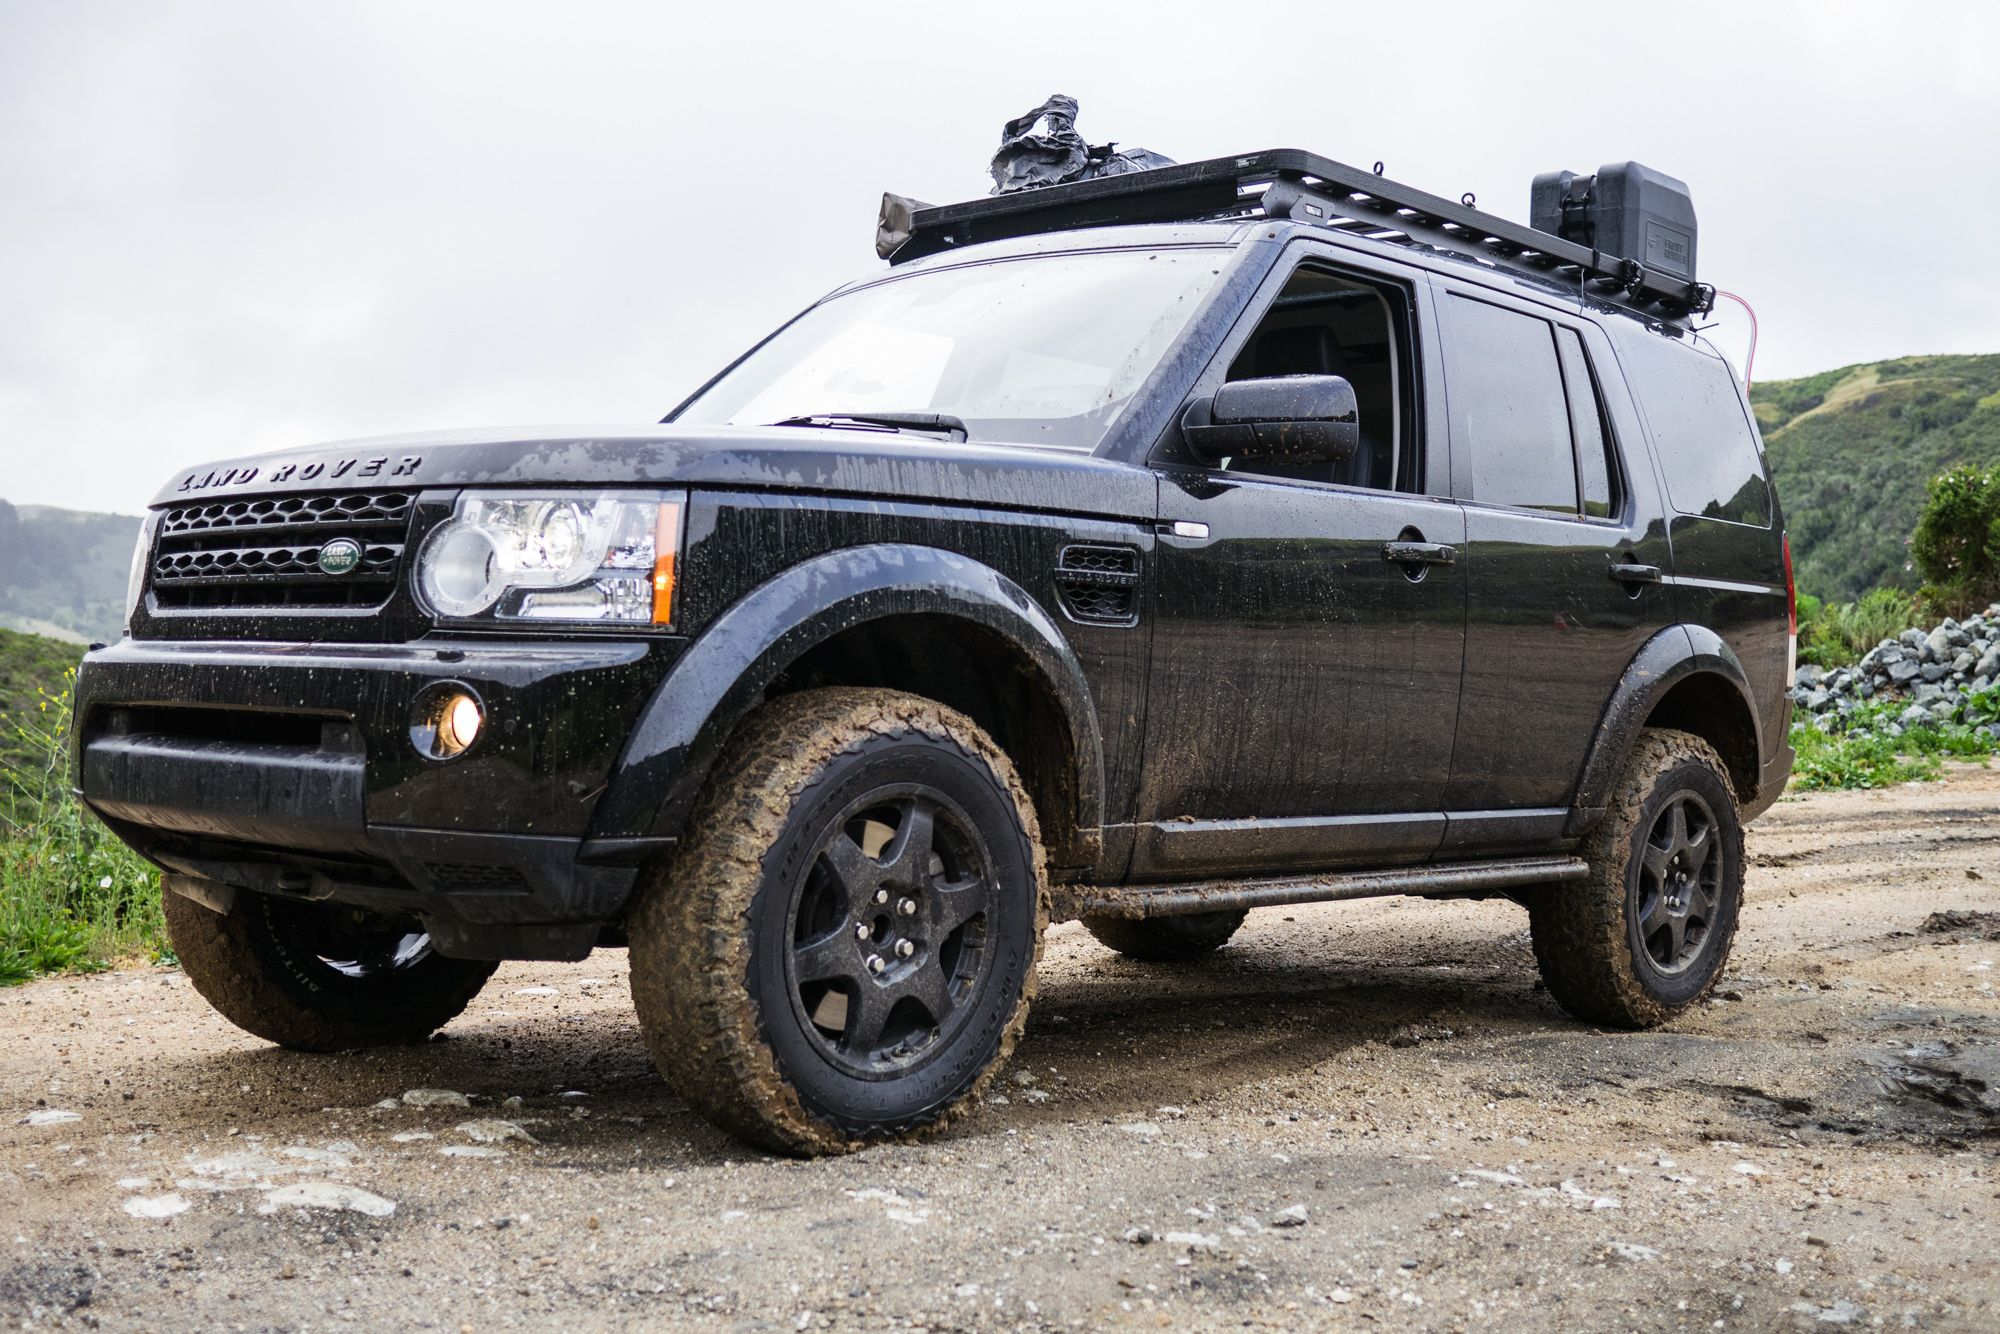 Bumper design 101 Land Rover Forums Land Rover and Range Rover